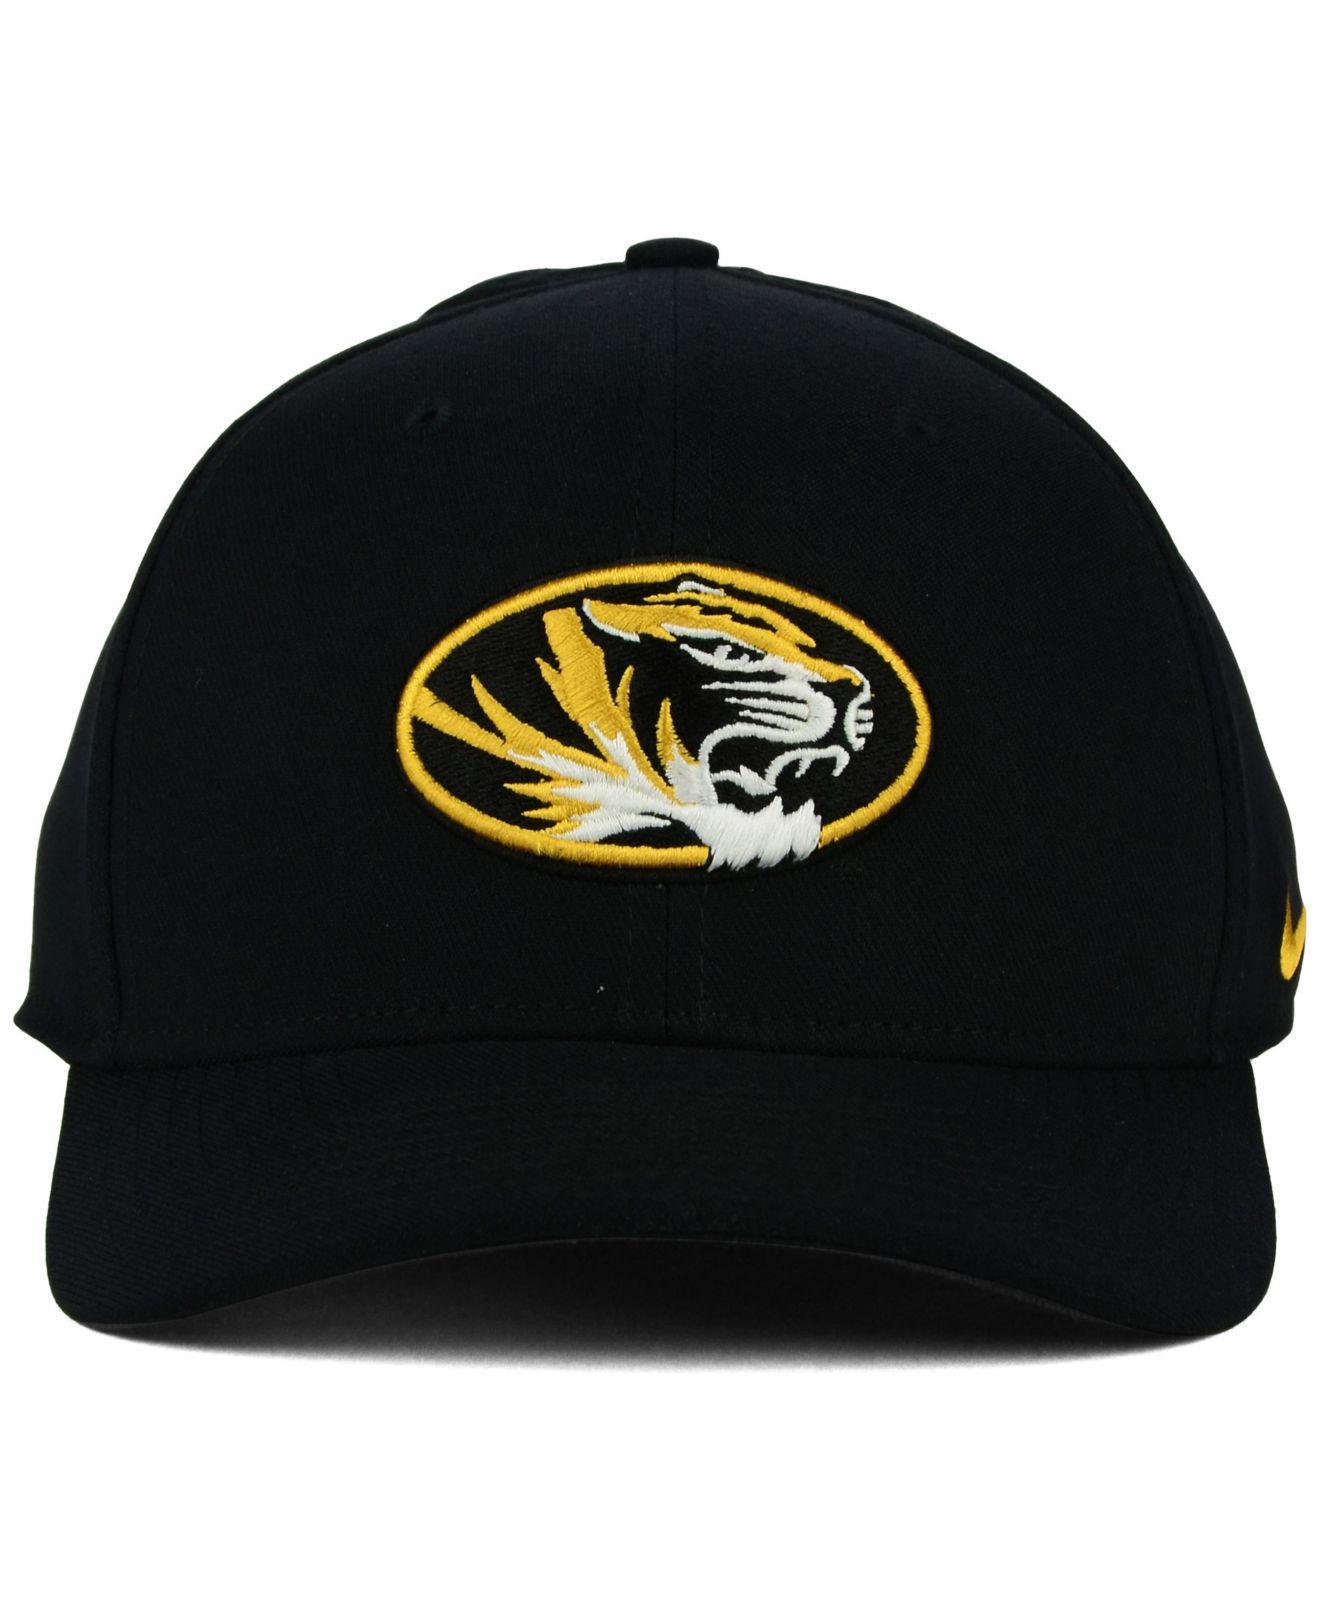 online retailer 98753 747ea ... reduced lyst nike missouri tigers classic swoosh cap in black for men  ea725 78e09